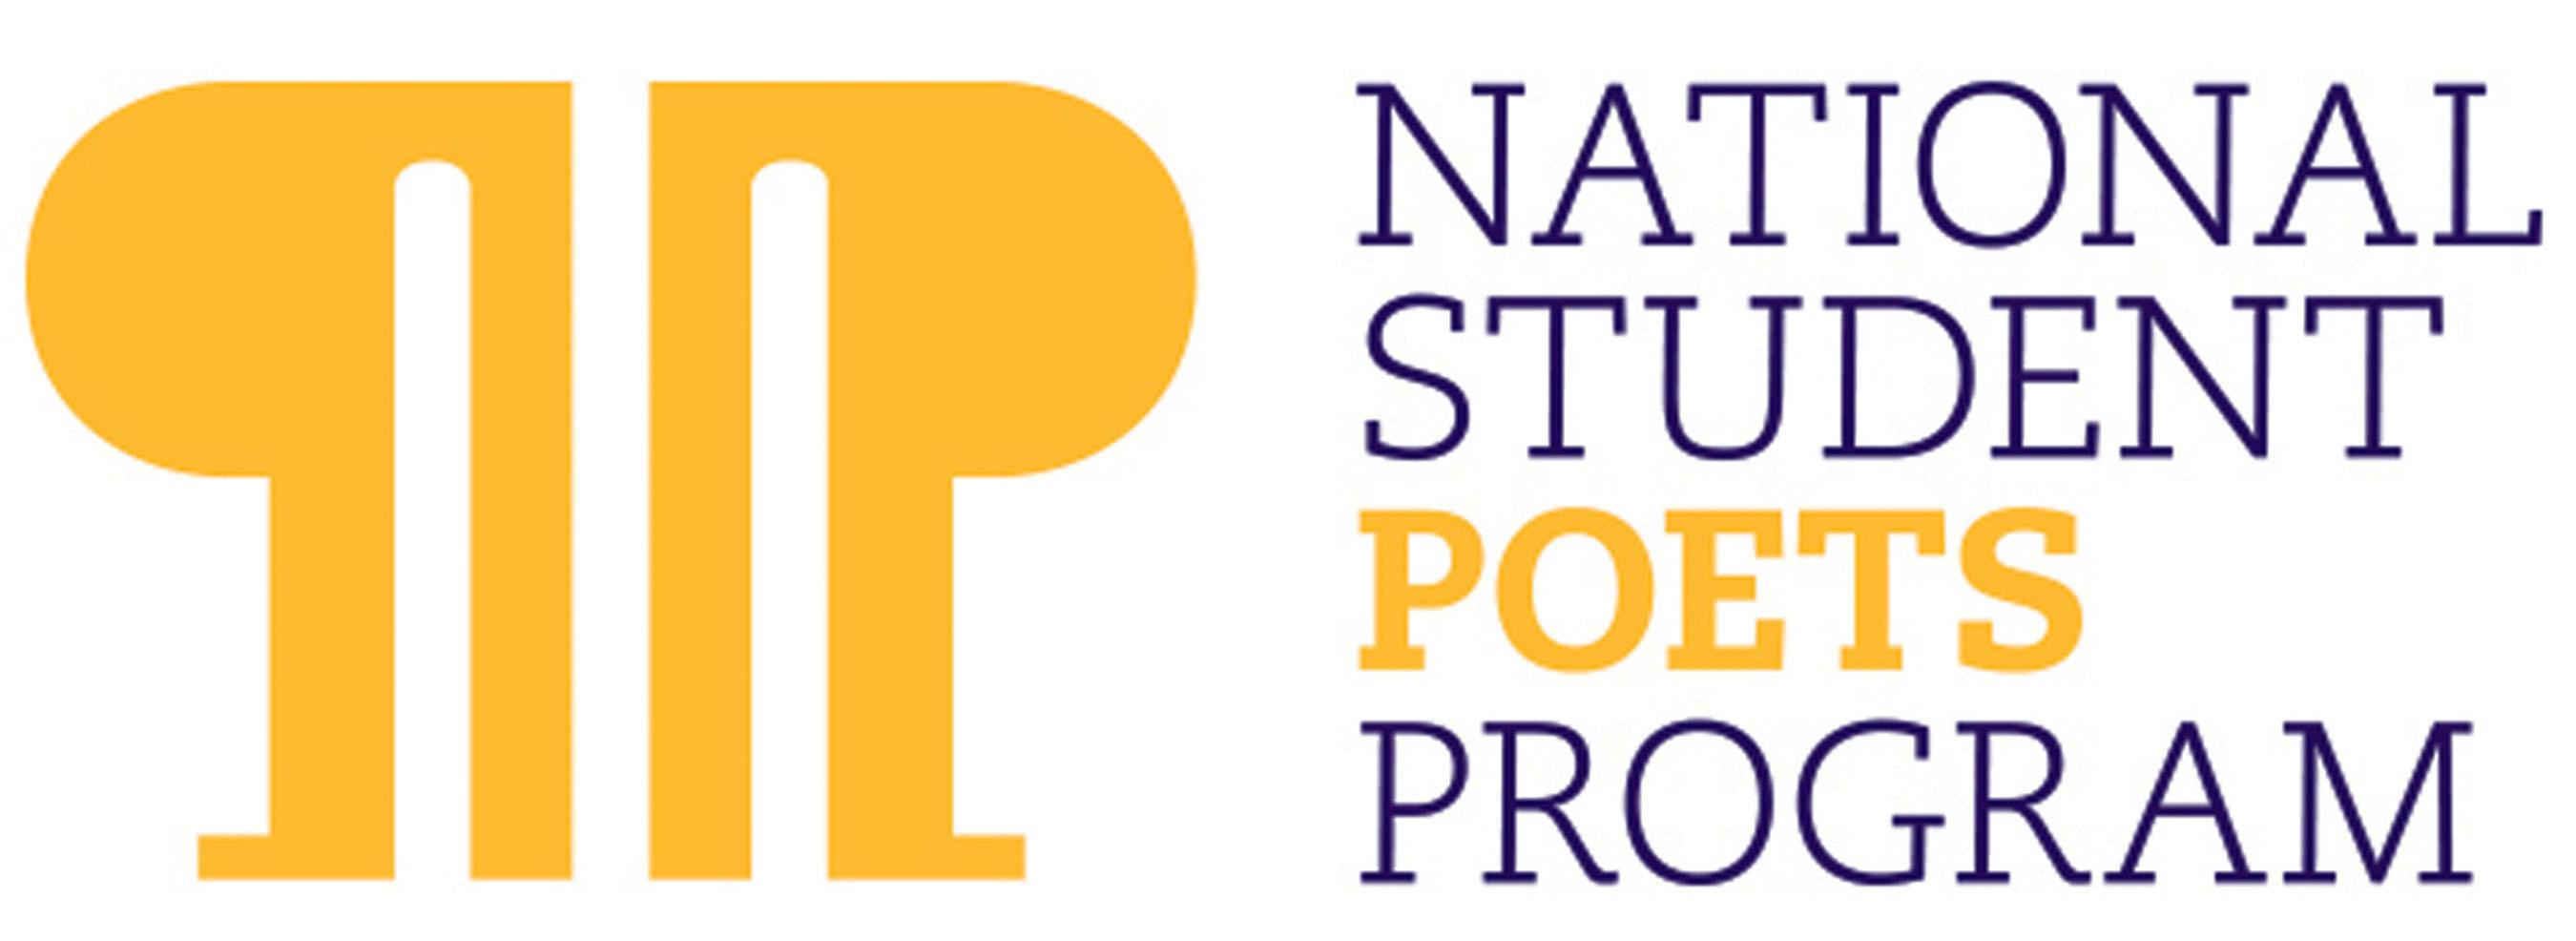 National Student Poets Program Logo.